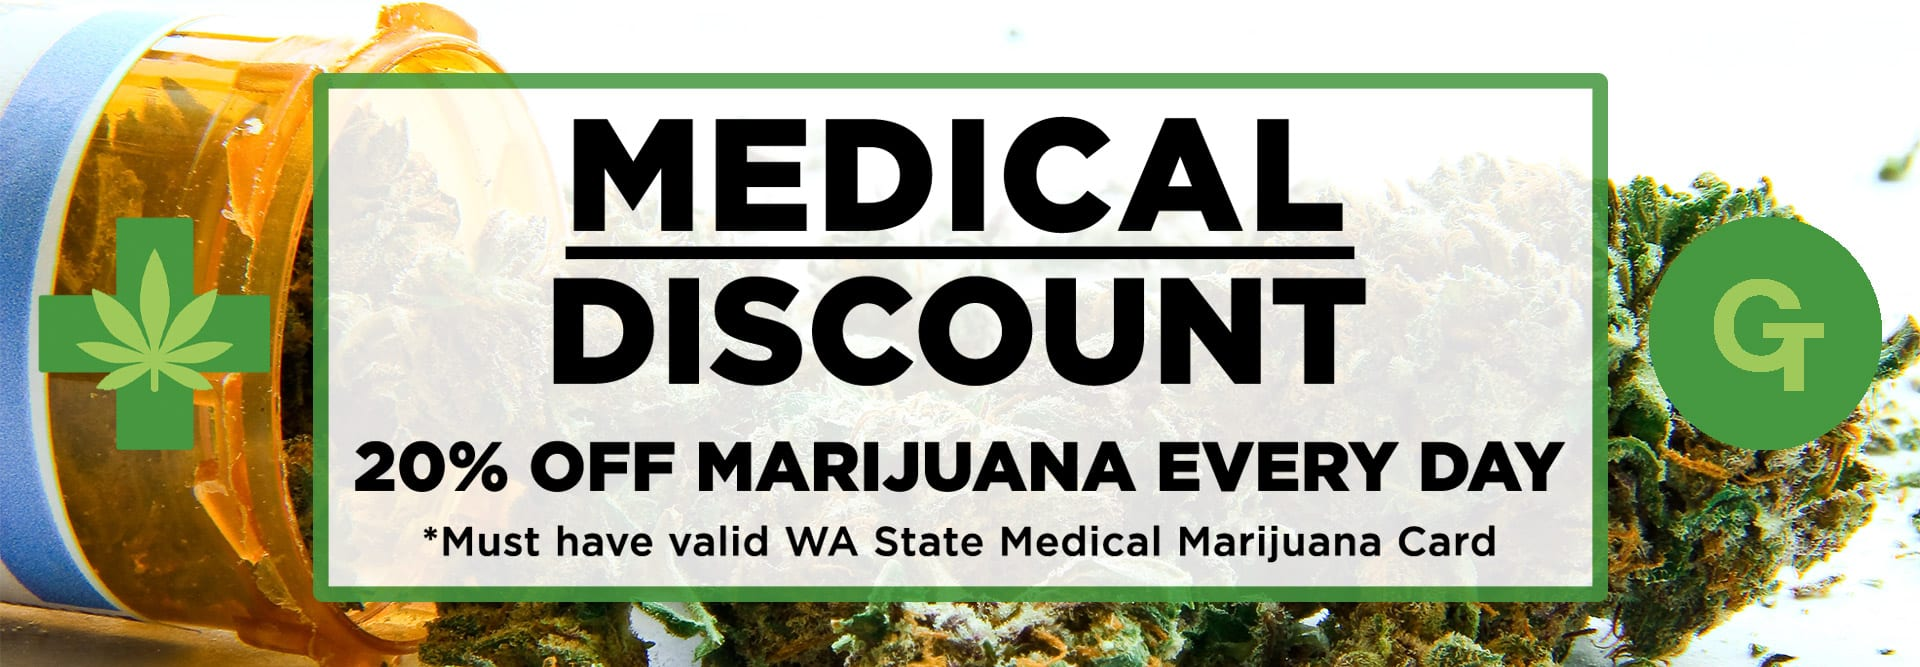 Medical-Discount